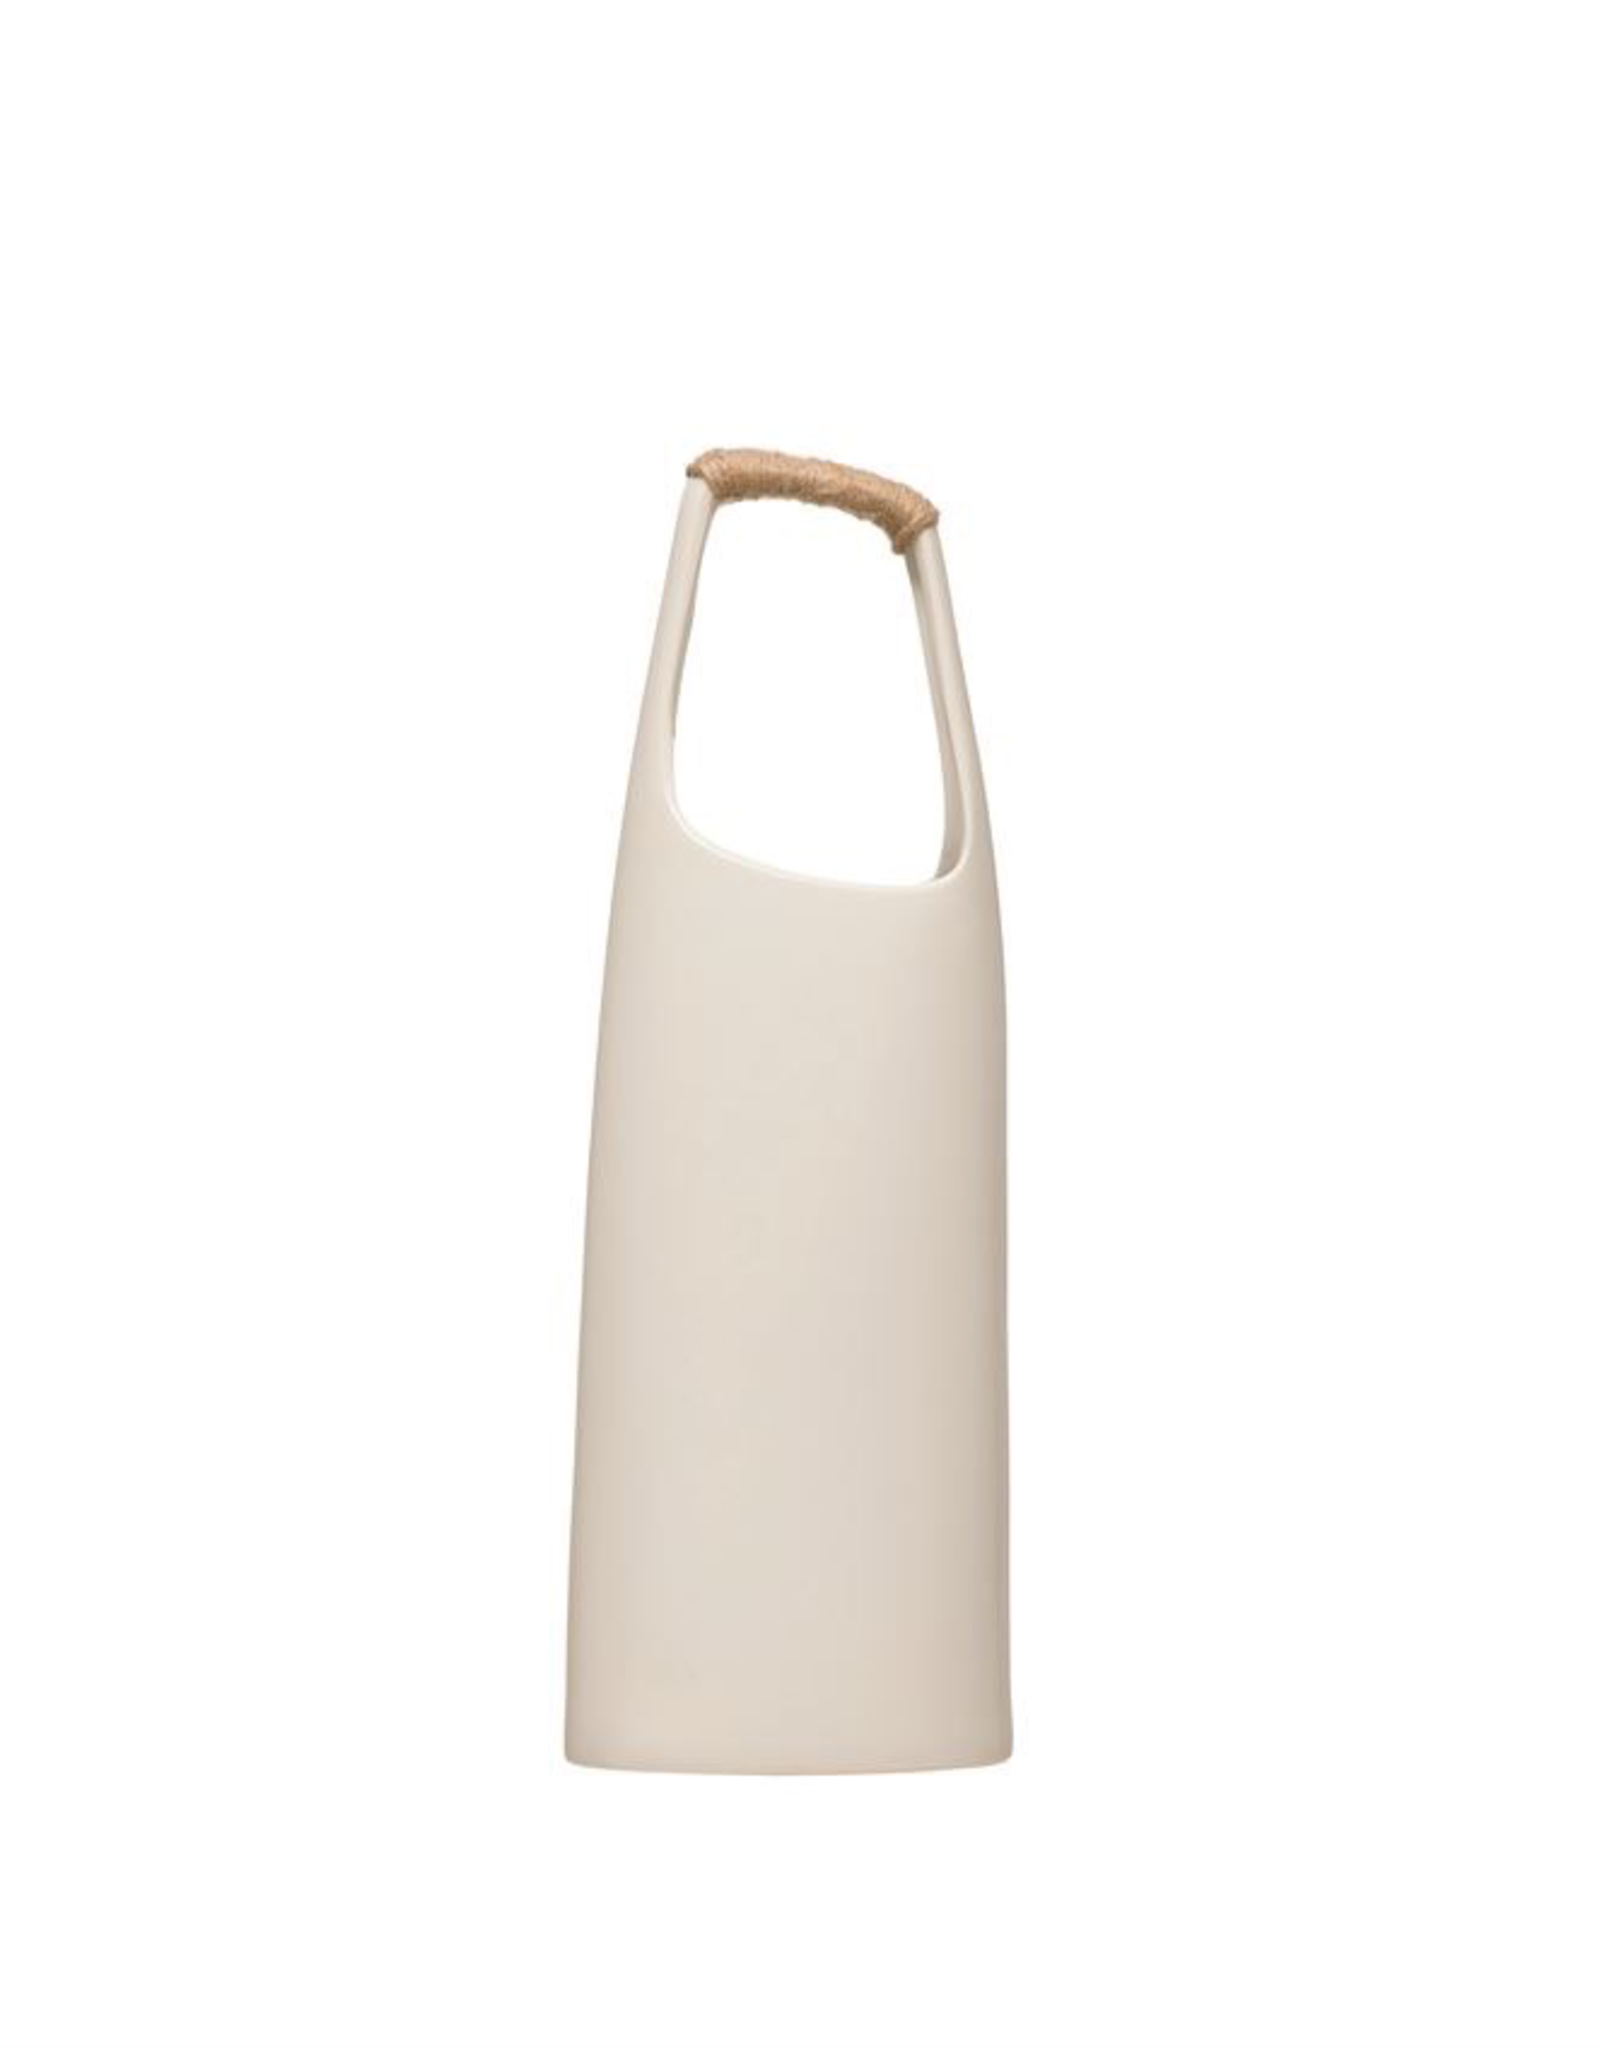 "Stoneware Vase, Rattan Wrapped Handle, White, H15"""